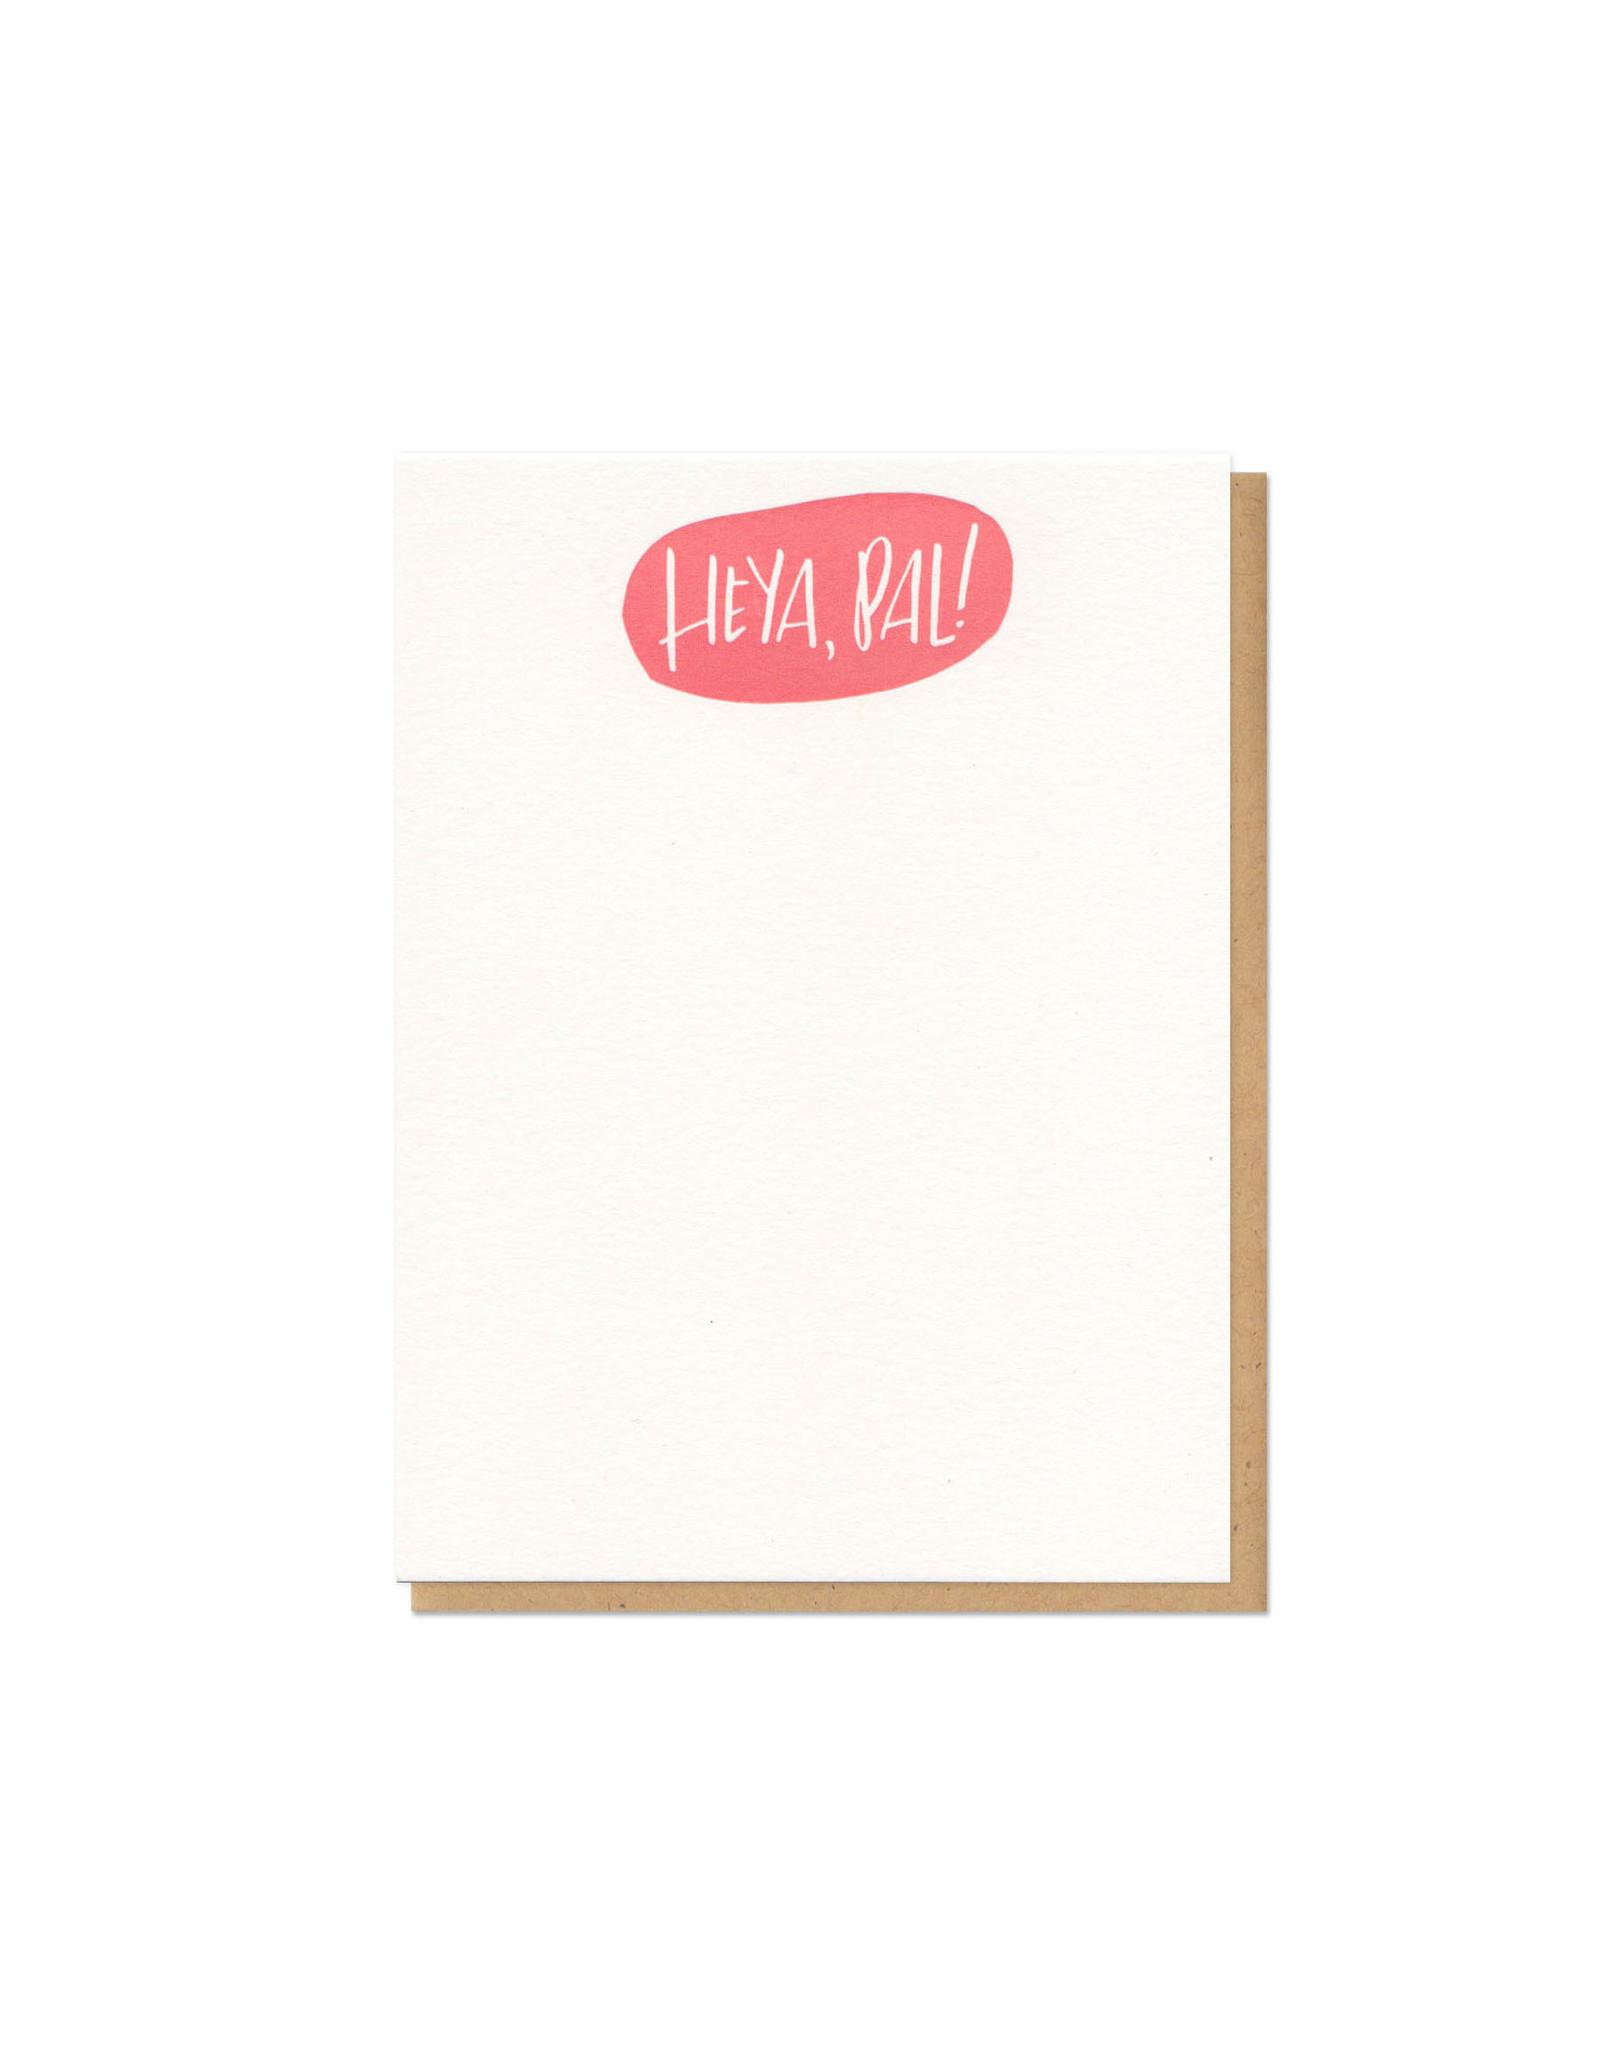 Heya, Pal Single Flat Card